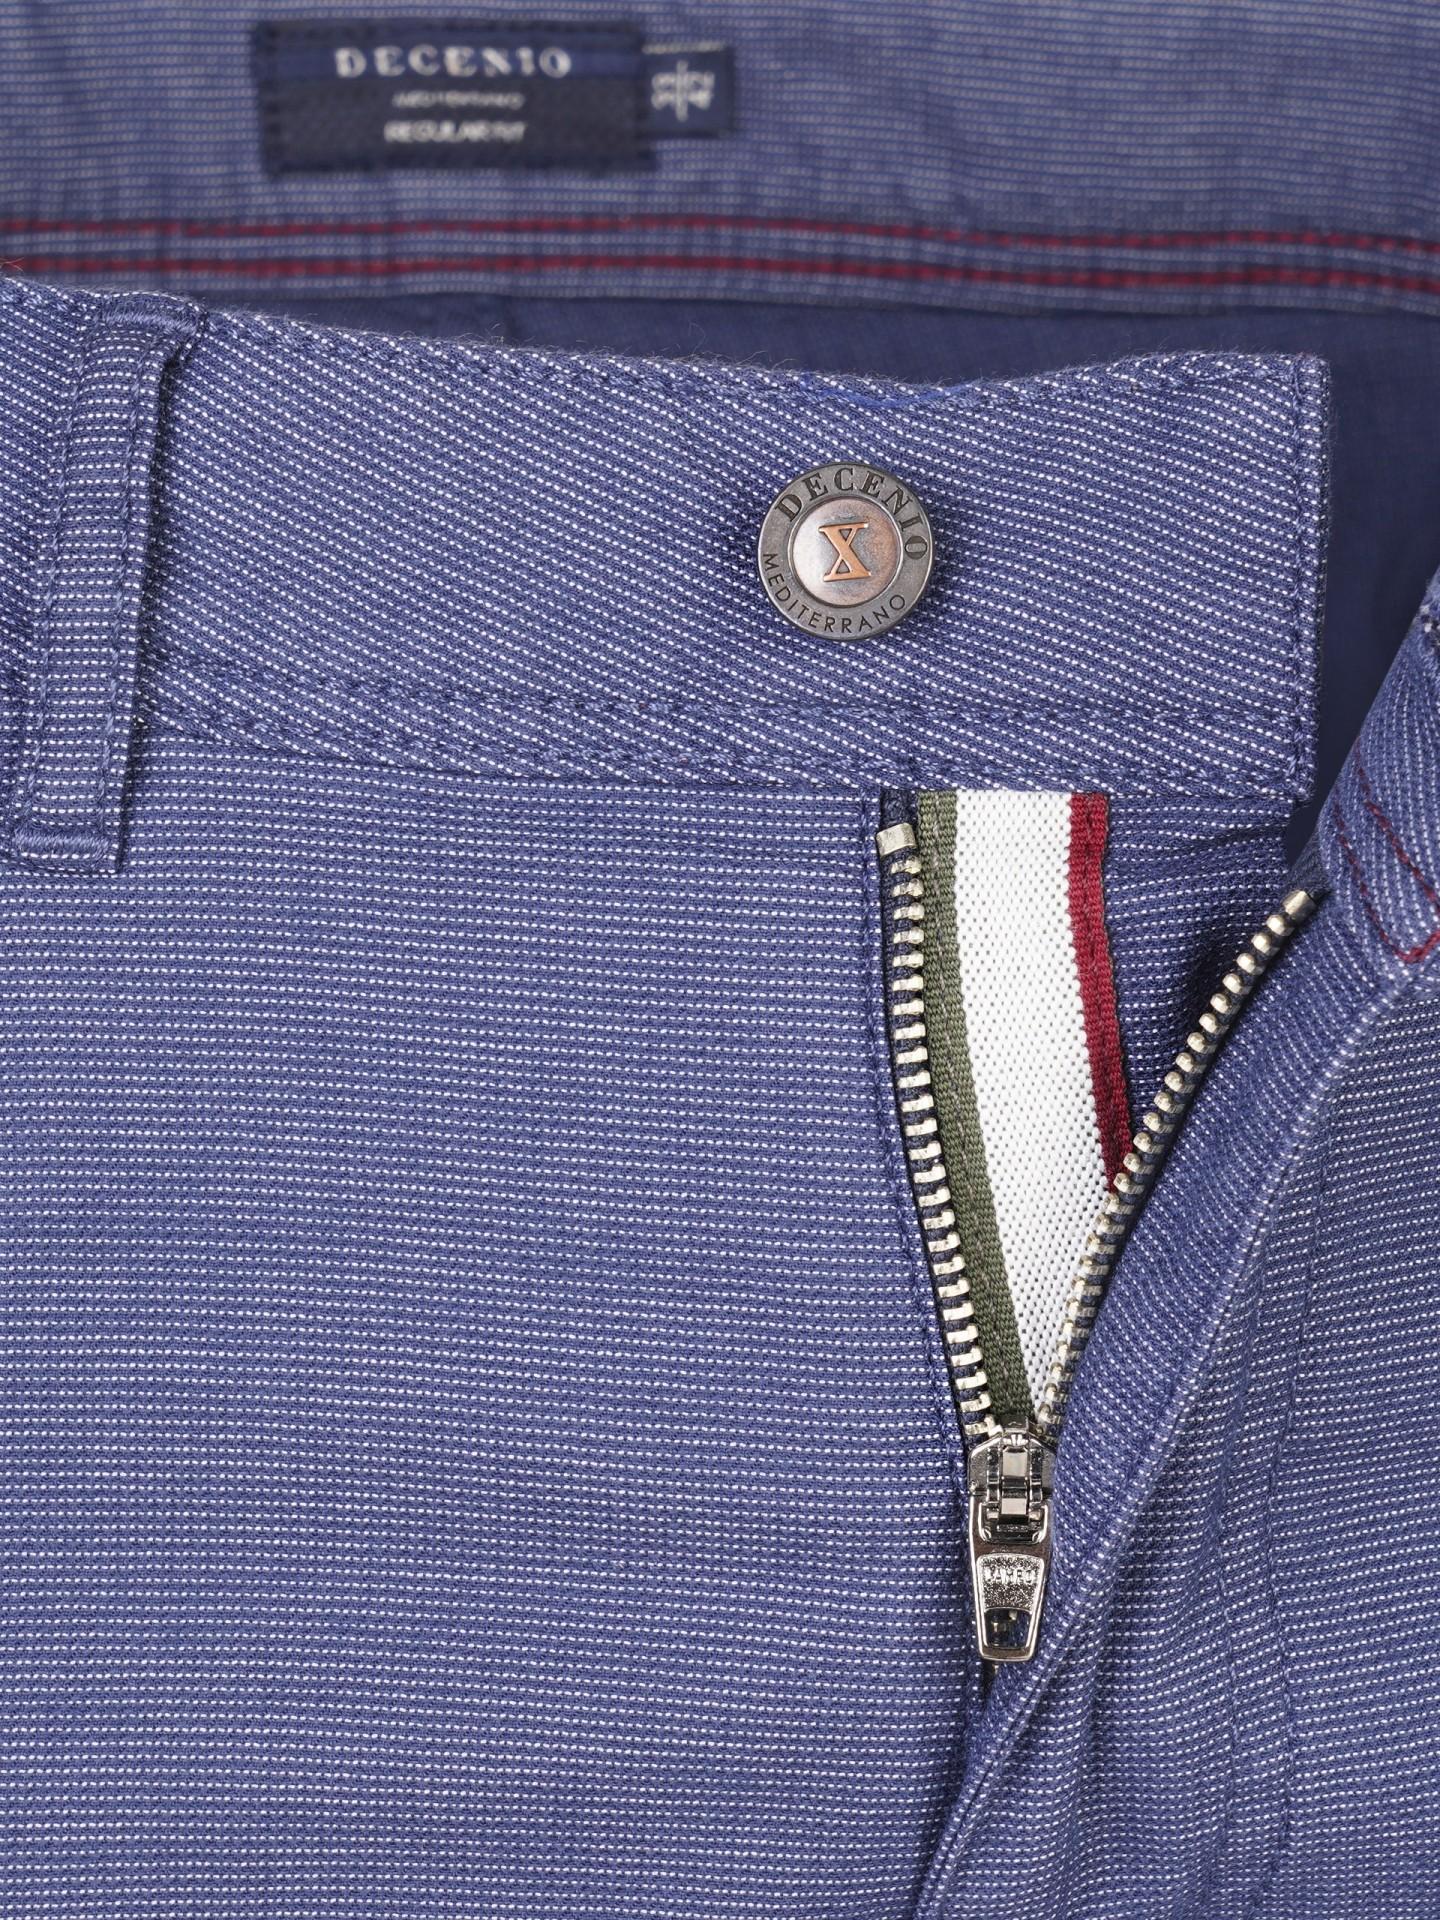 Calça 5 pocket regular fit Decenio